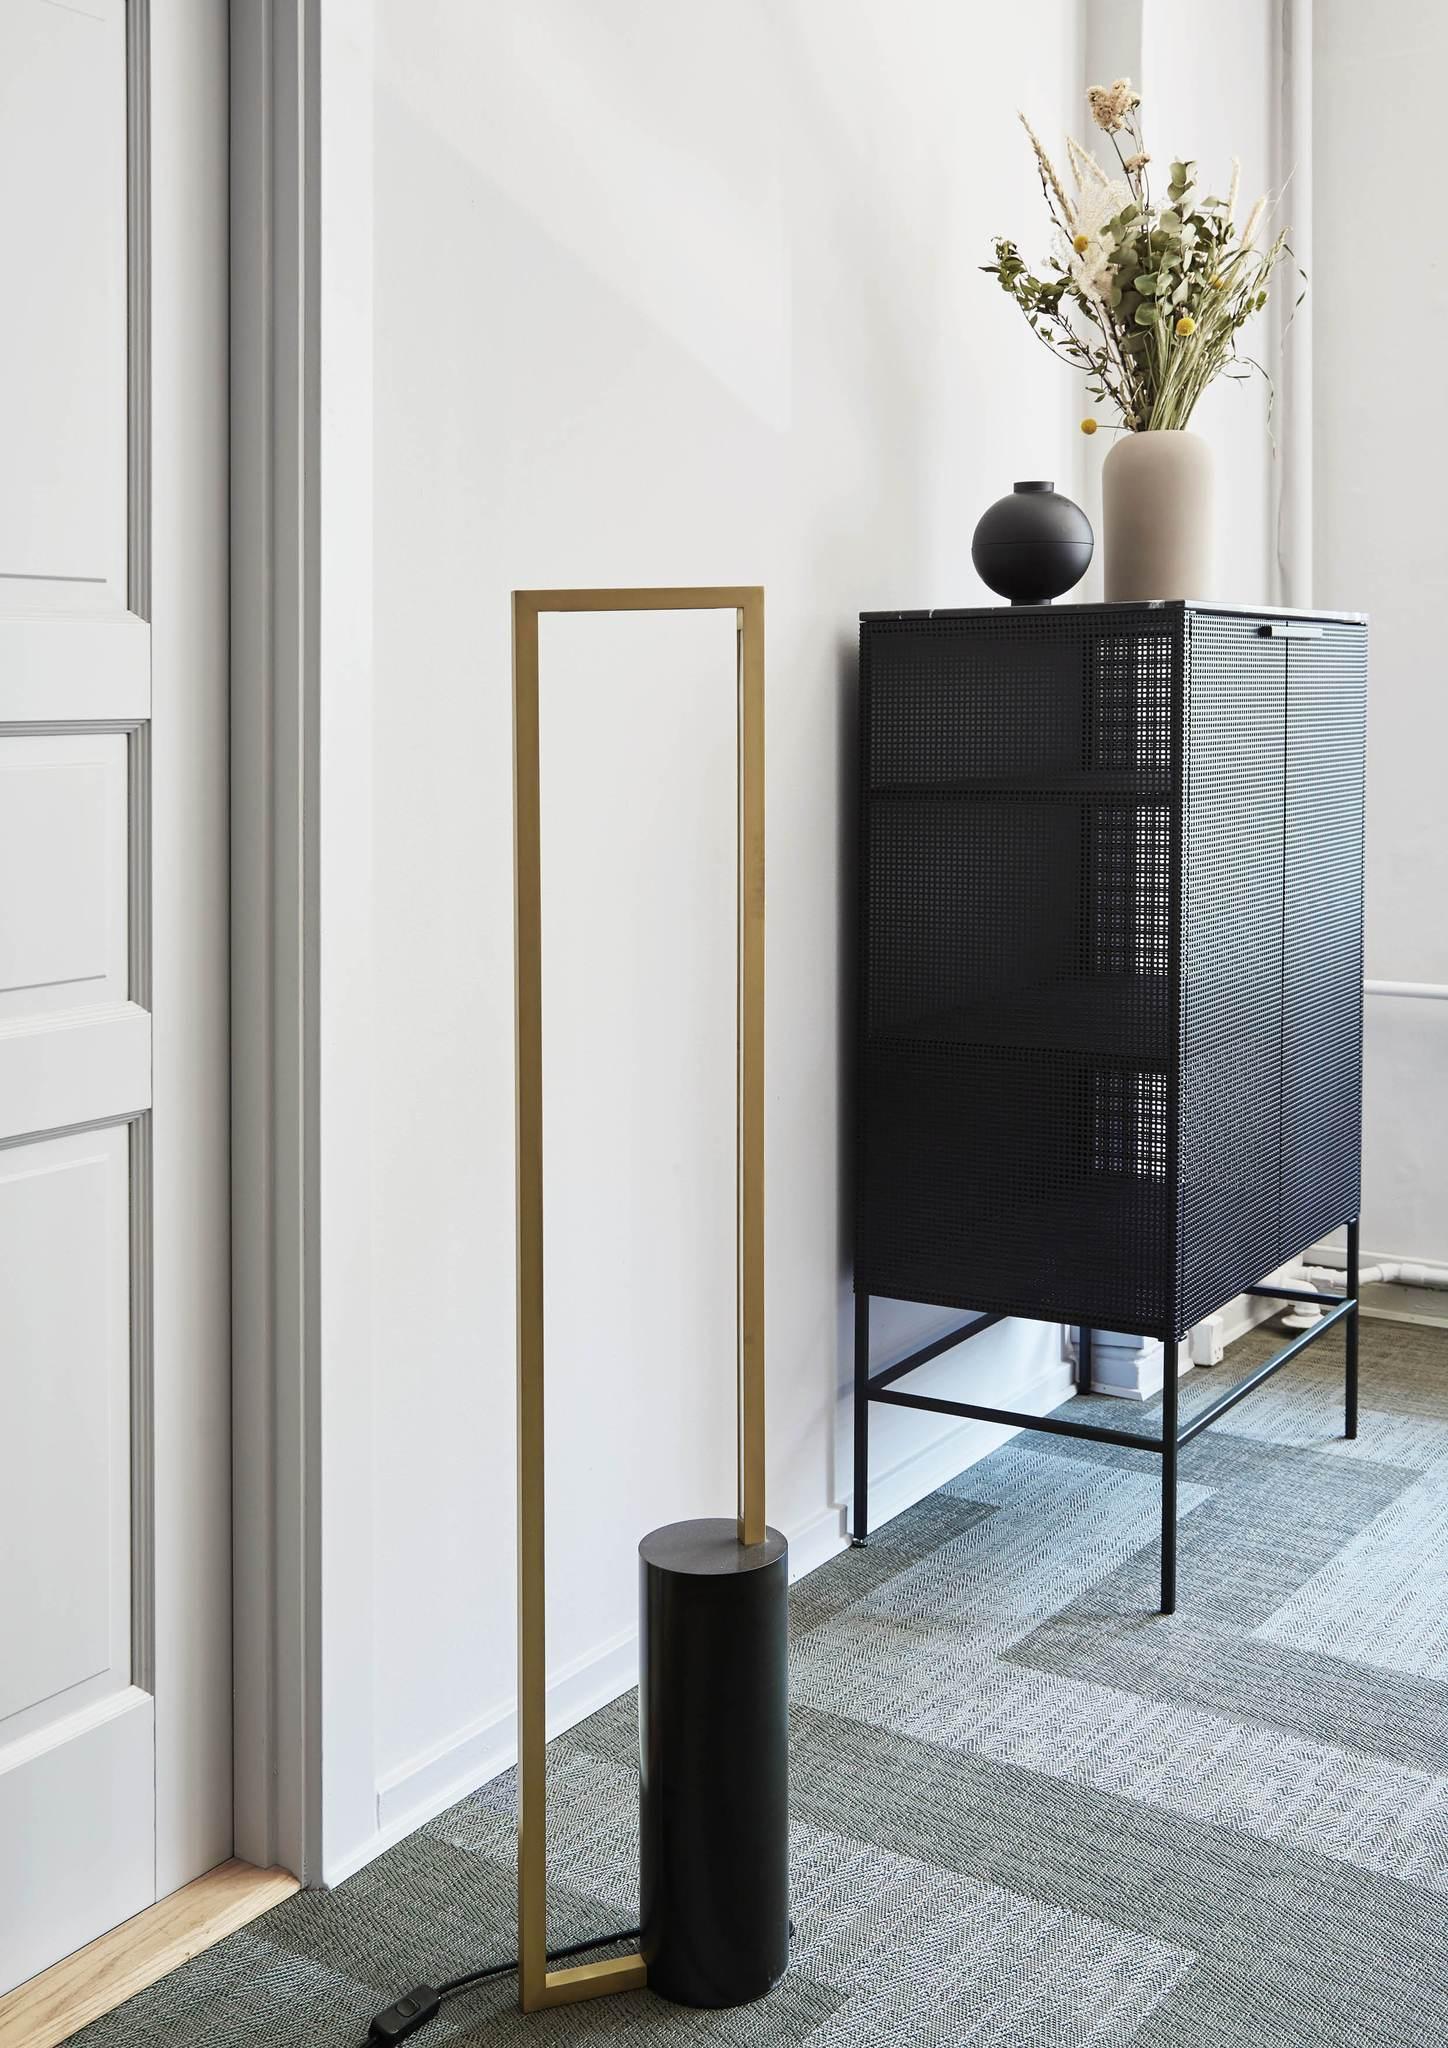 Kristiana-dam-studio-interio-office-5.jpg